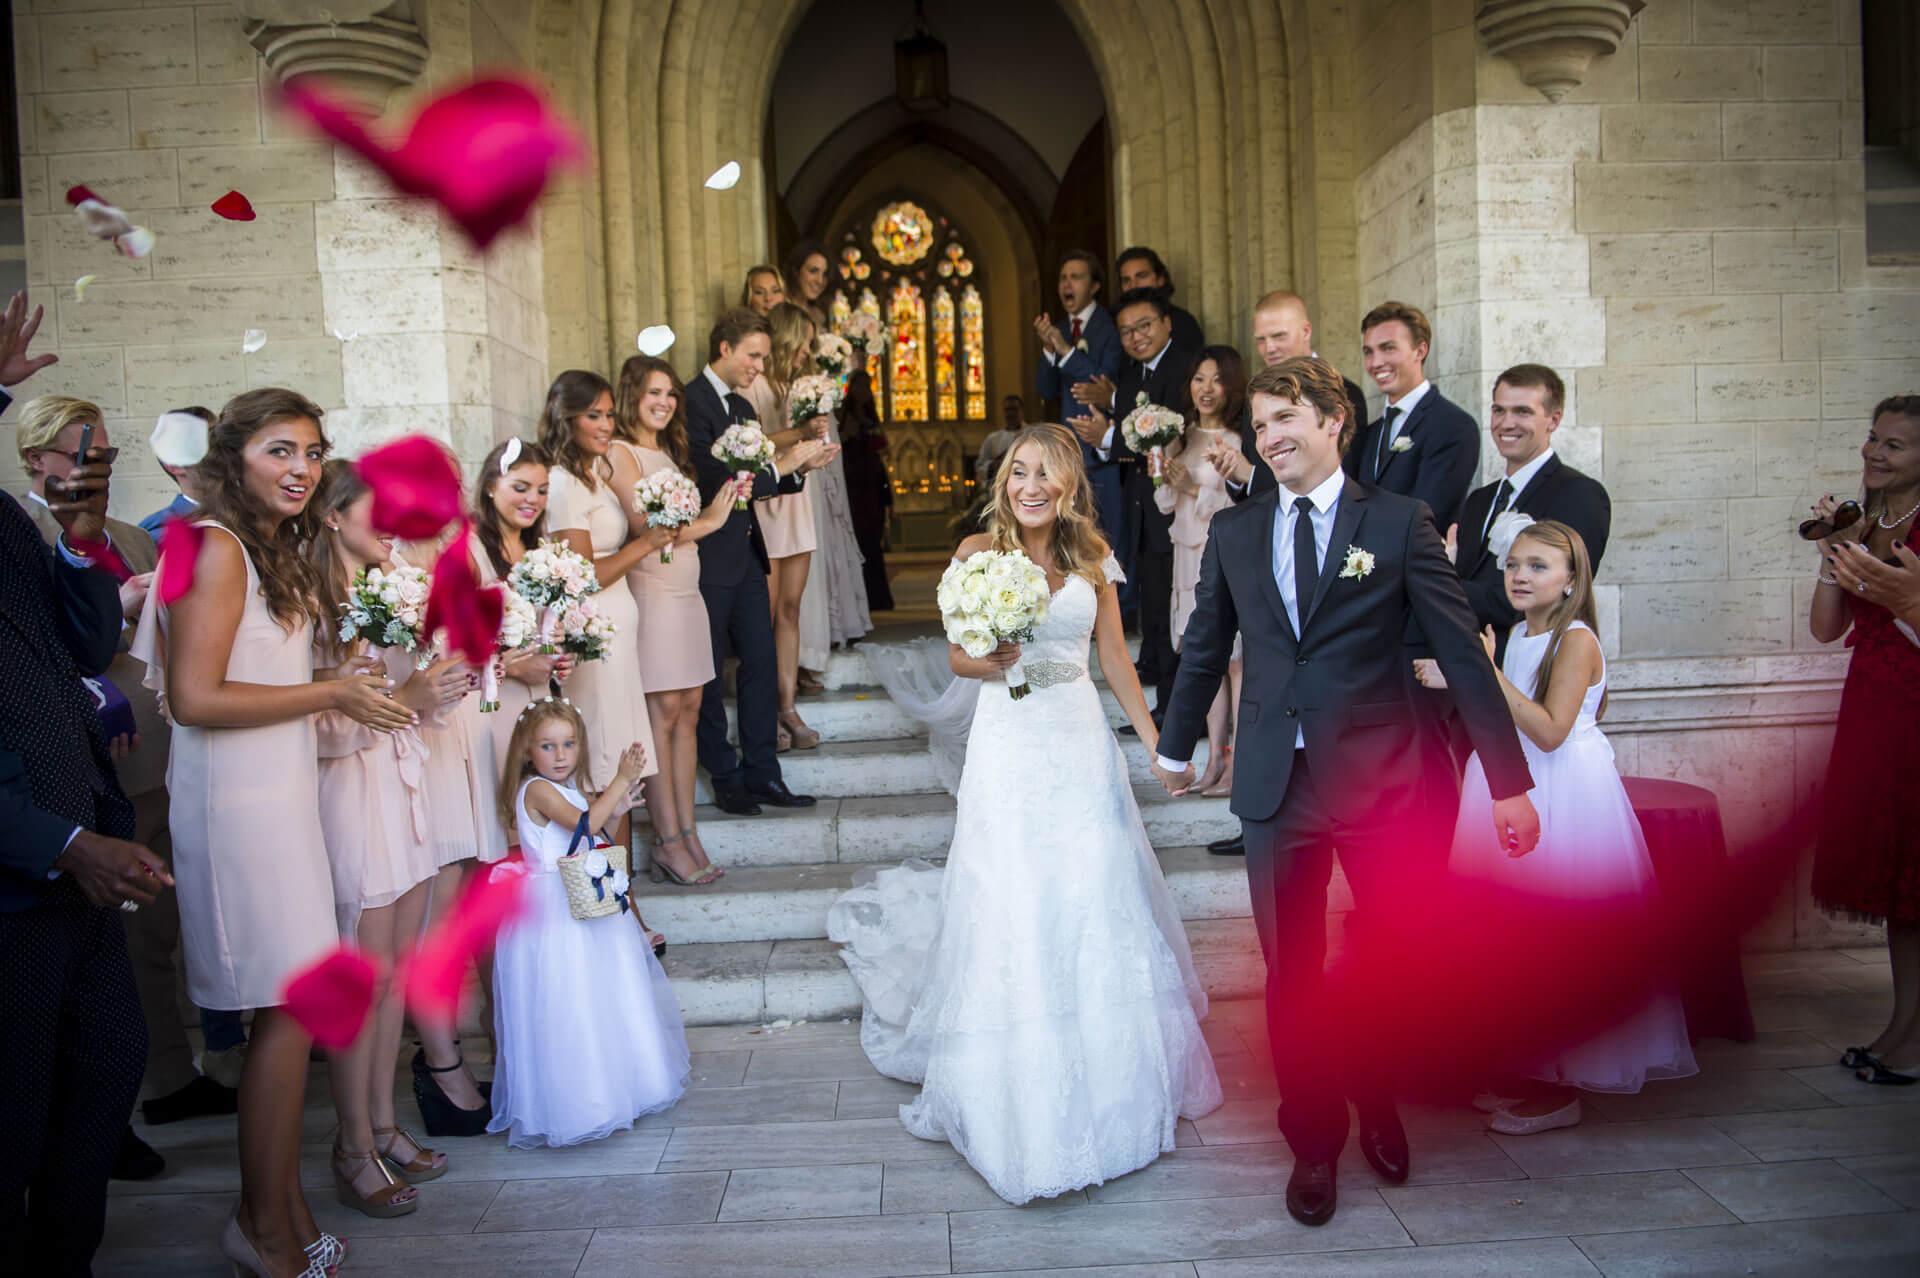 The Italian Villa Gallery Multi Award Winning Wedding: Florence Wedding In An Elegant Villa On The Tuscan Hills